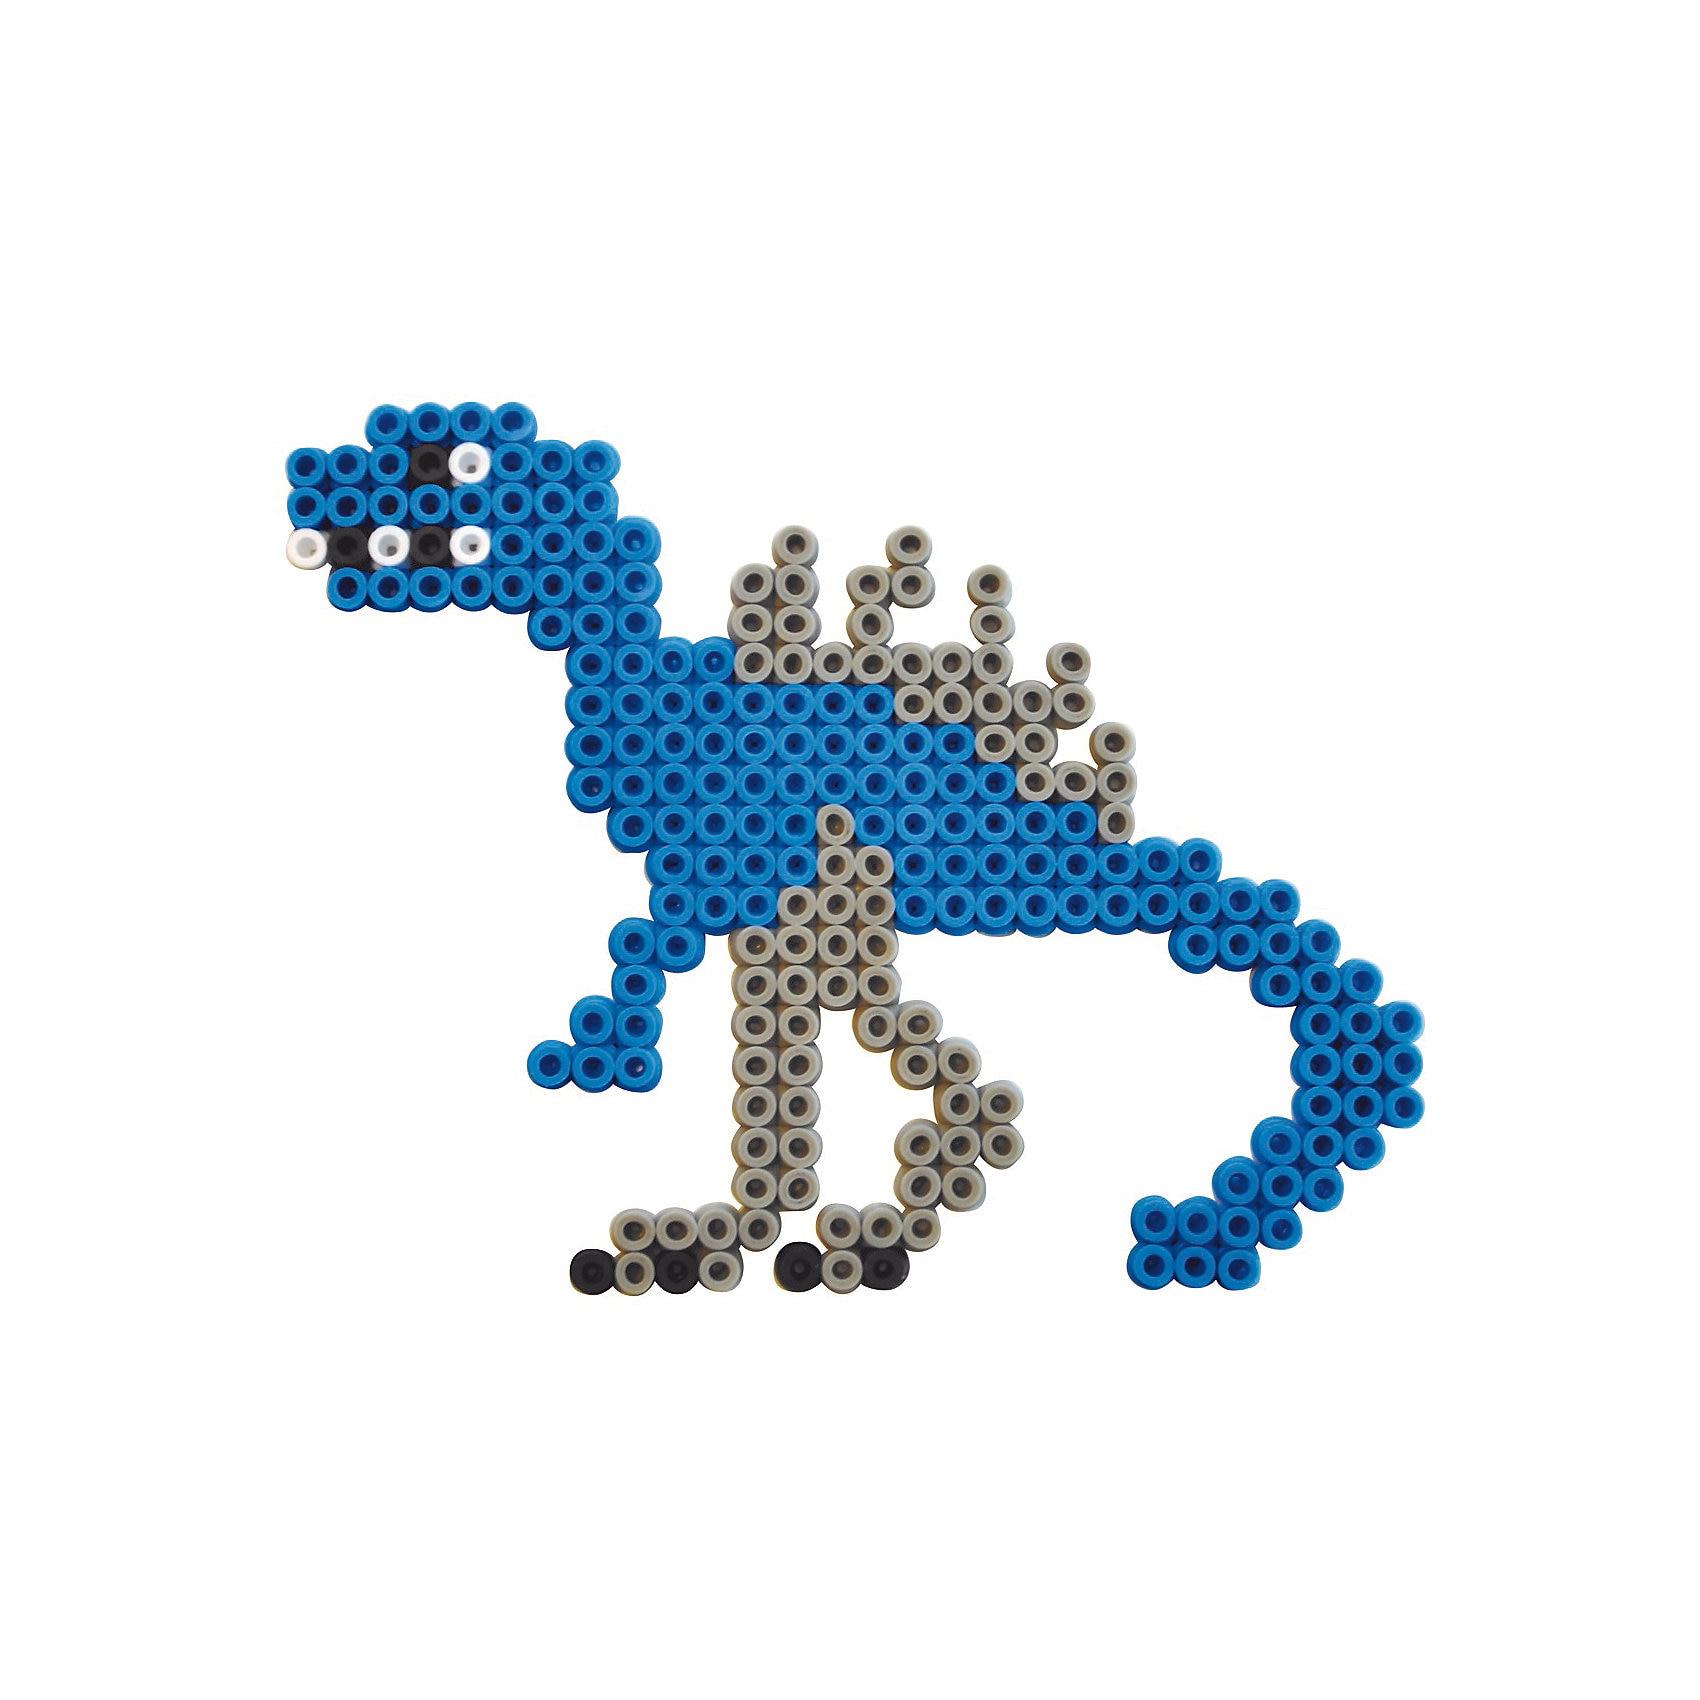 Playbox Bügelperlenset Dino 2.000 Perlen